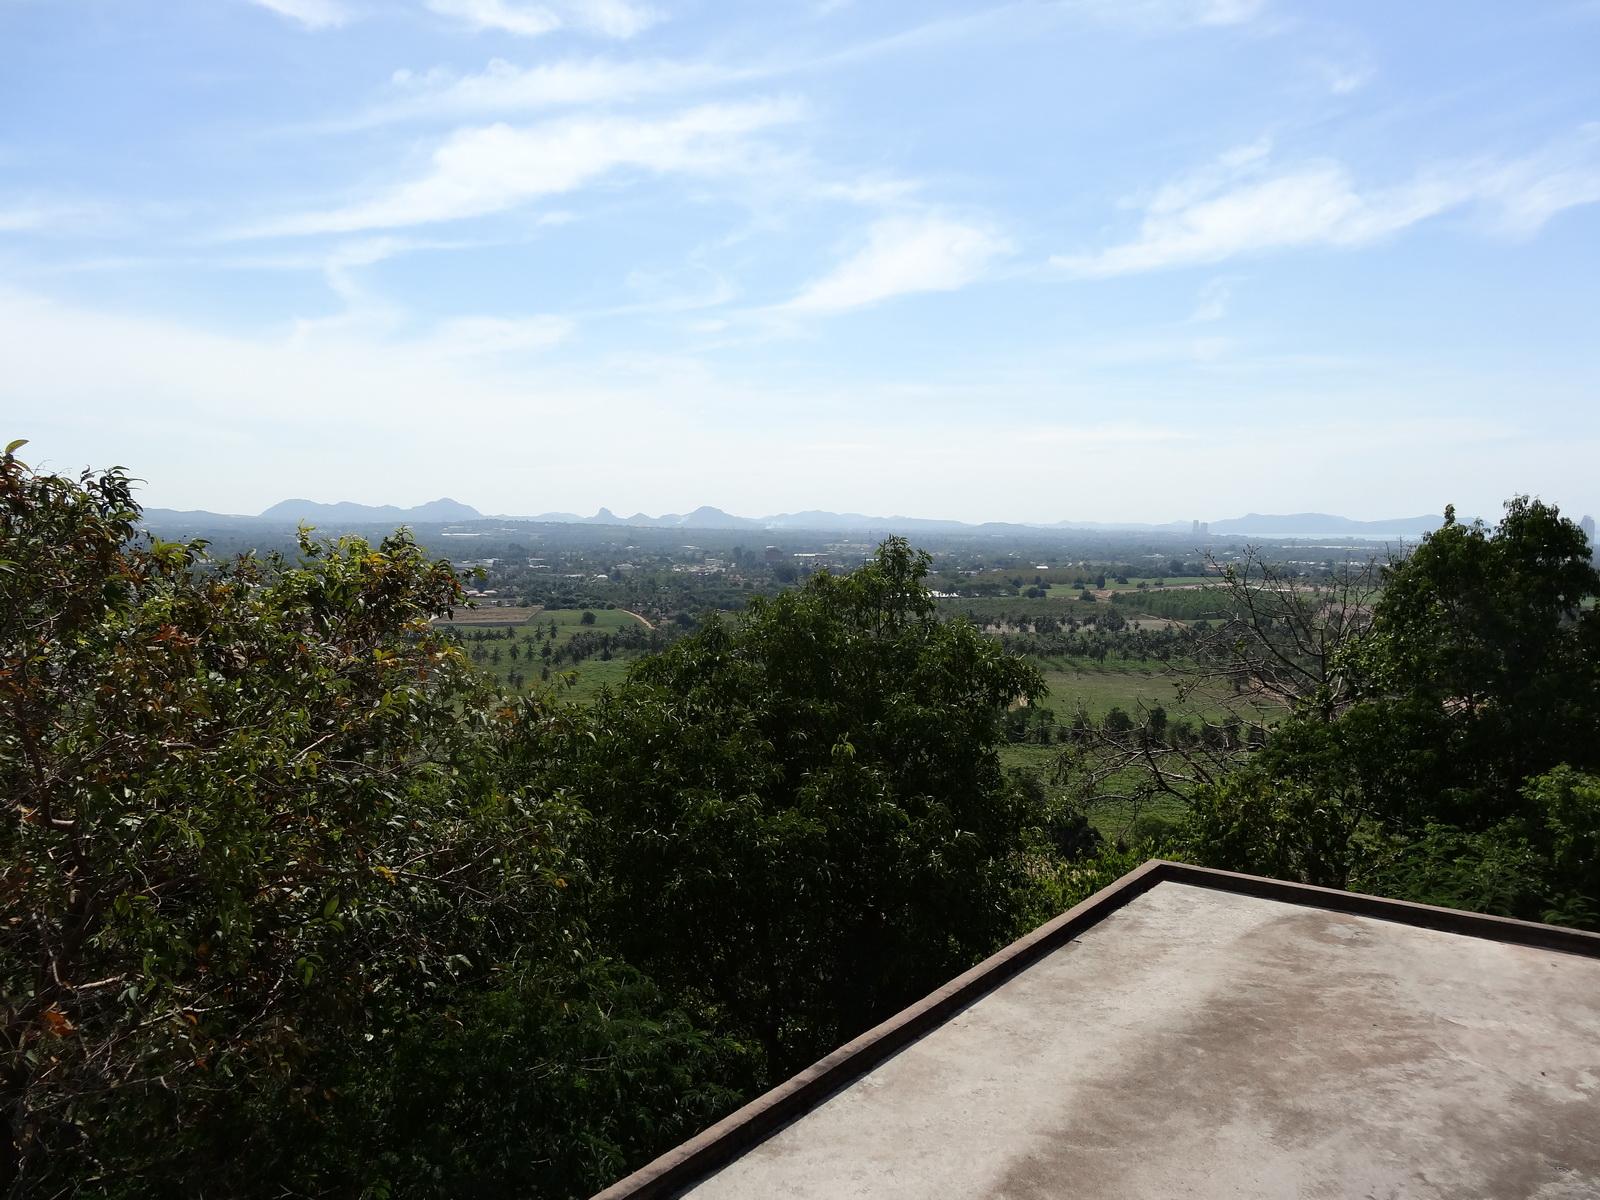 20 Pattaya 307